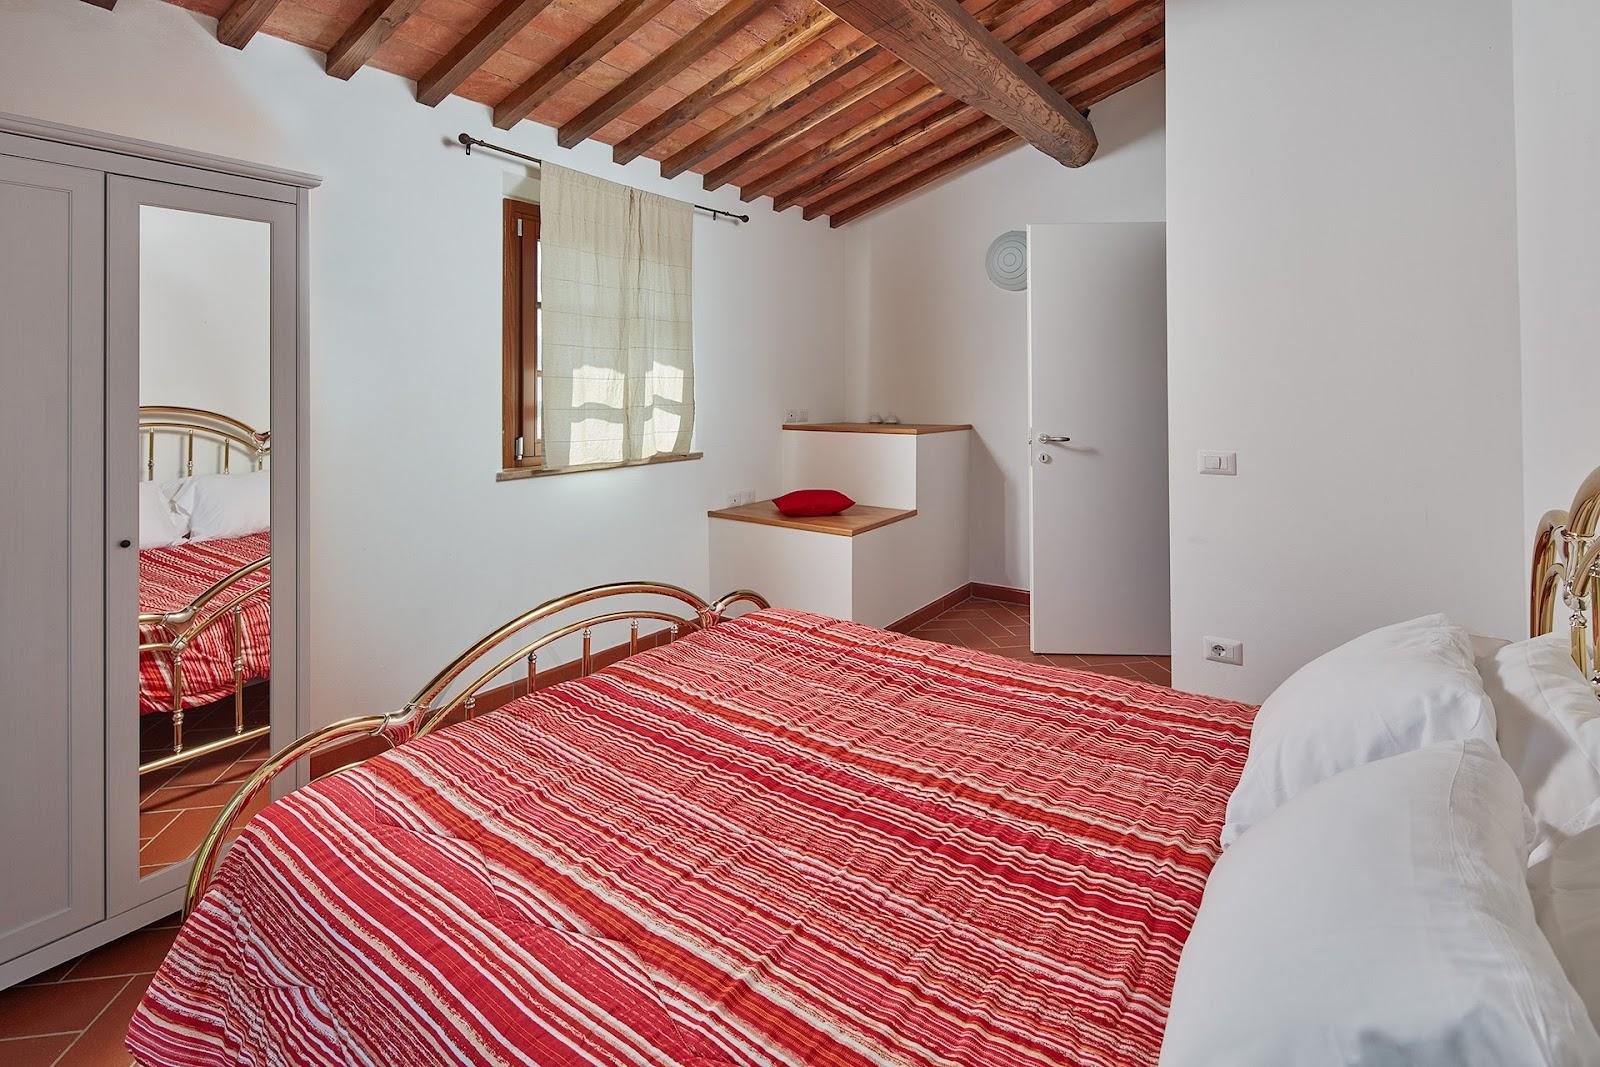 Ferienhaus Corte Paradiso (2570342), Monsummano Terme, Pistoia, Toskana, Italien, Bild 42